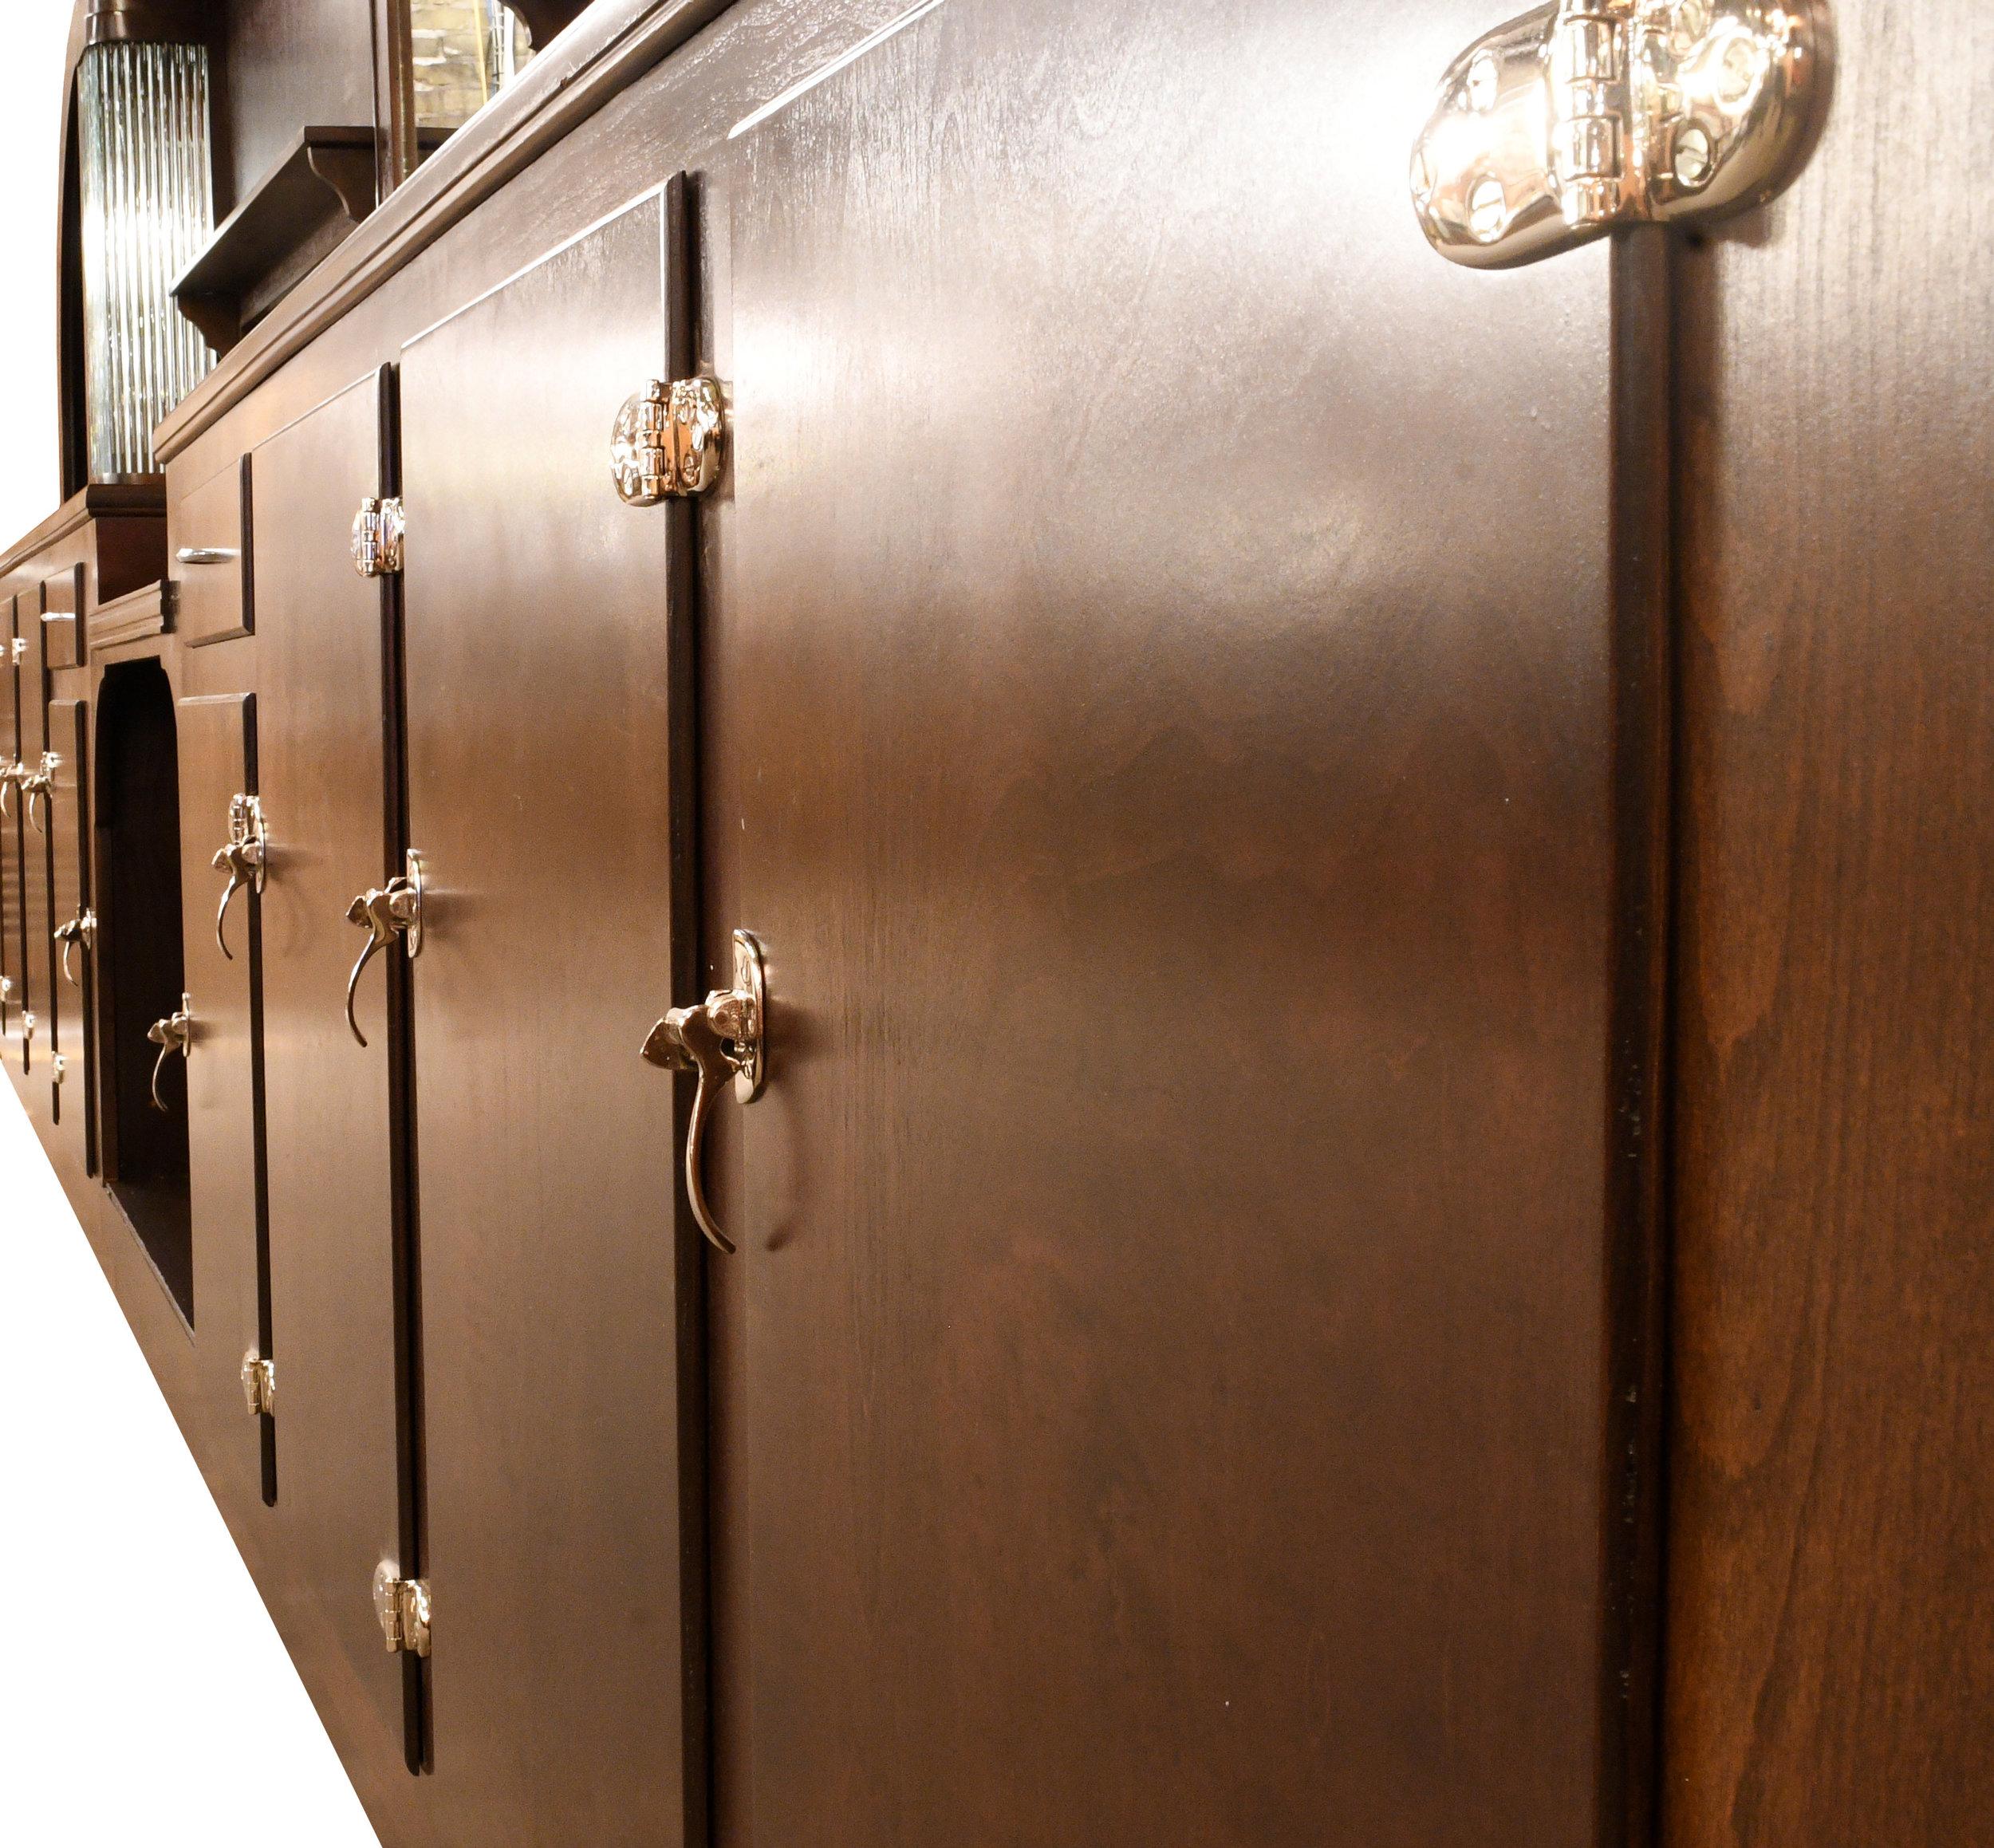 47687-art-deco-bar-hardware-and-cupboards.jpg